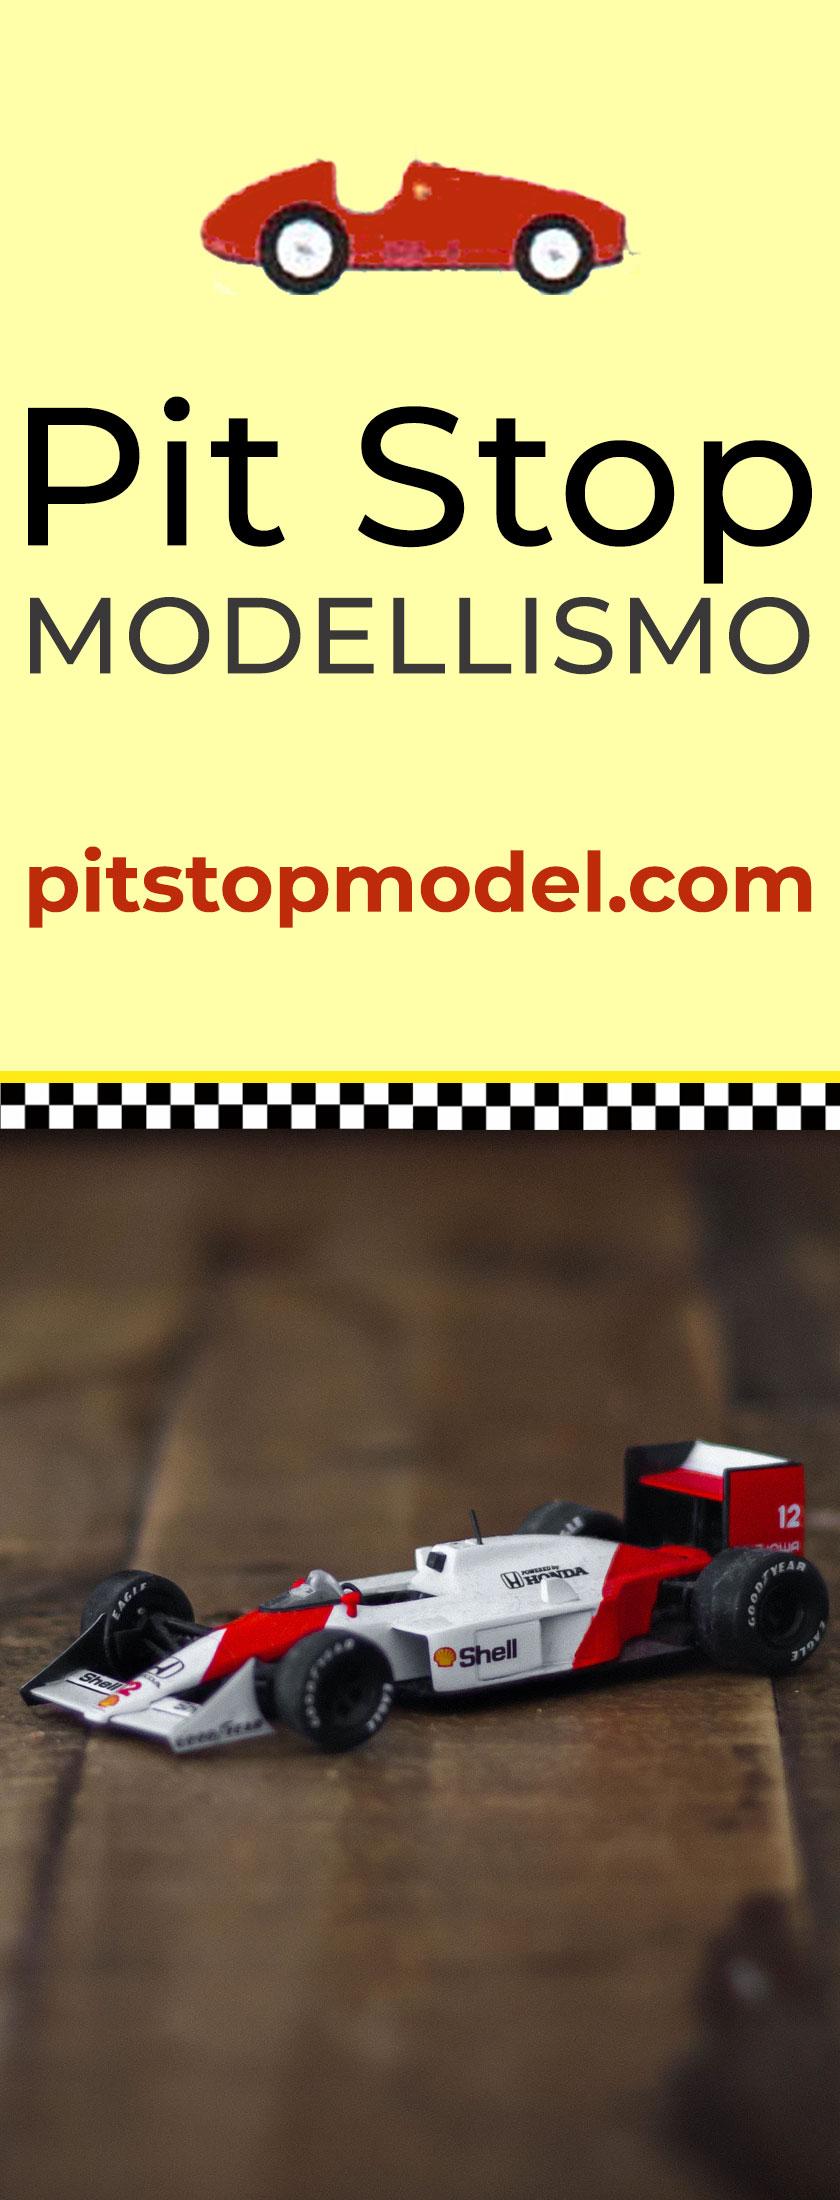 vai su Pitstopmodel.com